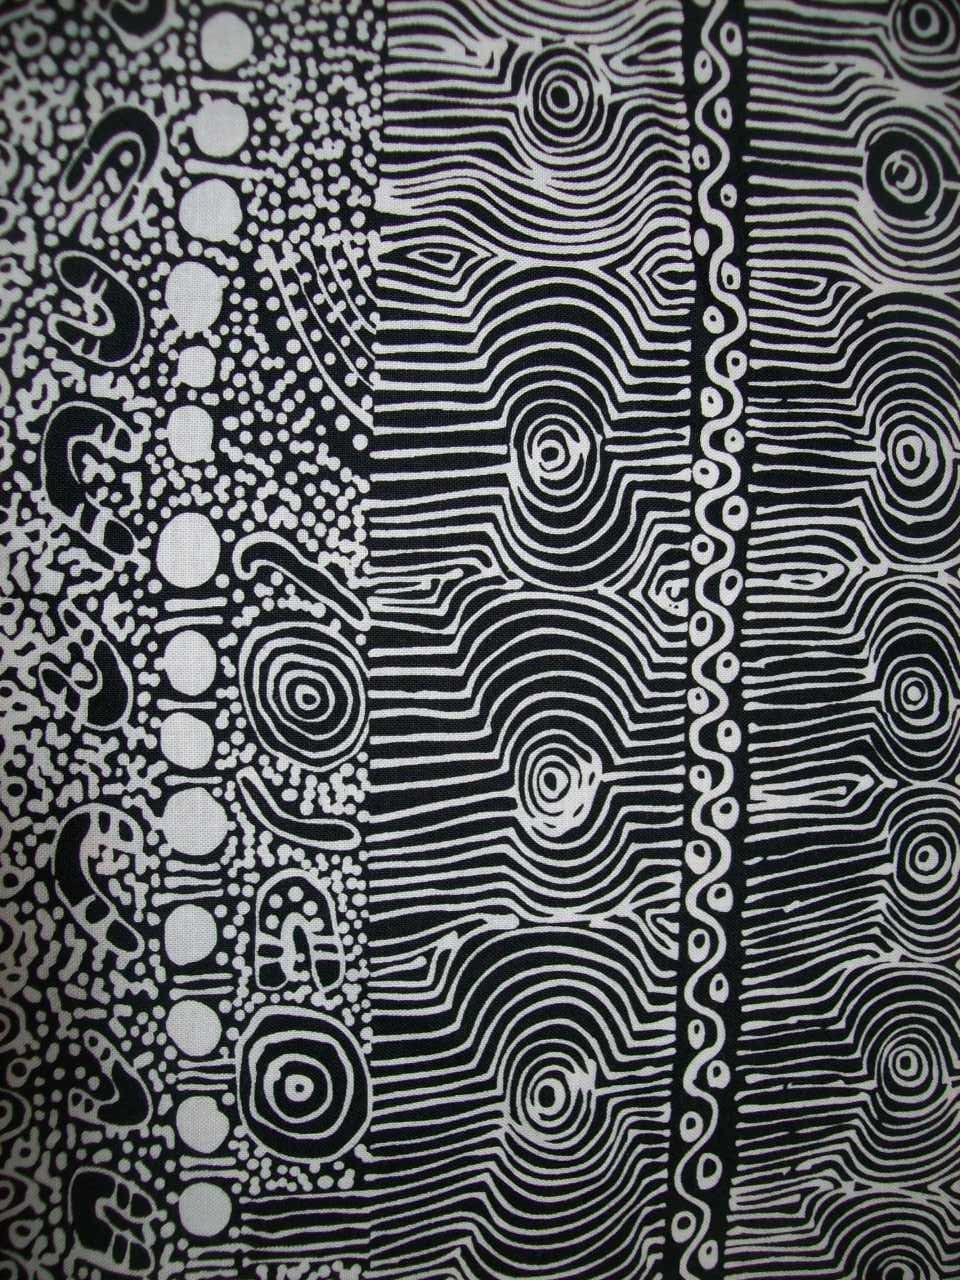 Per Yard Black And White Ethnic Designer Fabric Australian